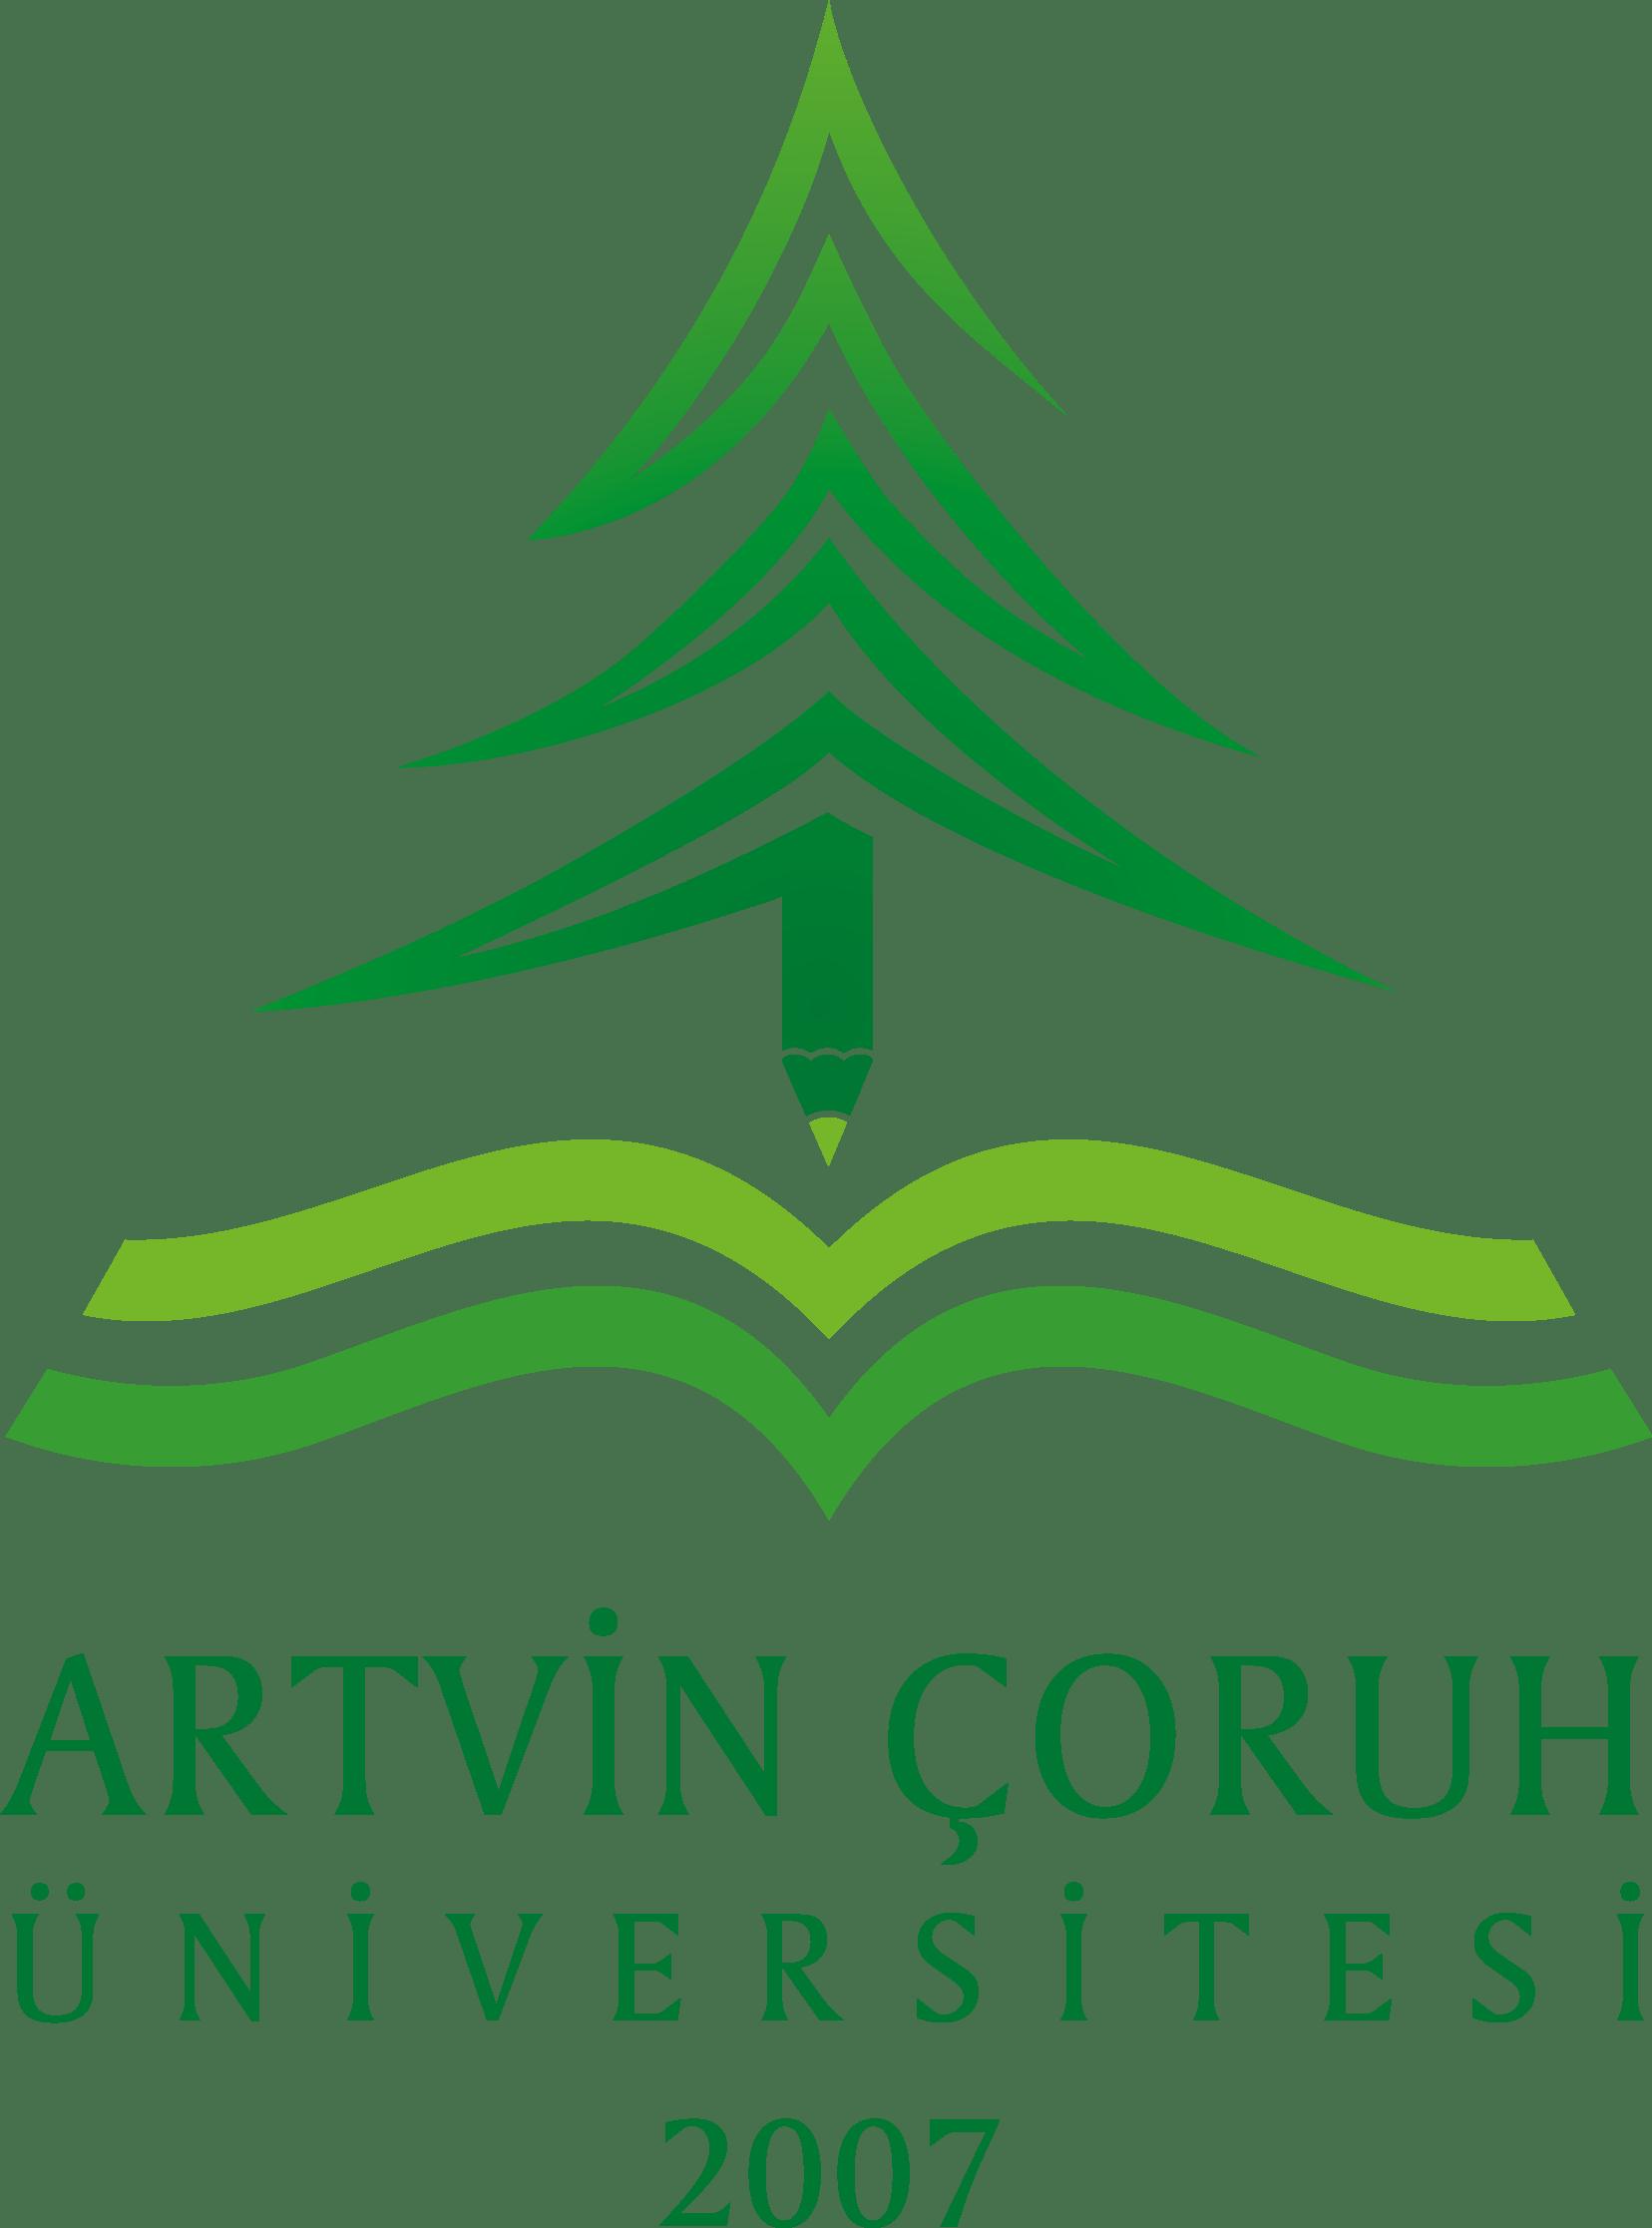 Artvin Çoruh Üniversitesi Logo   Amblem png